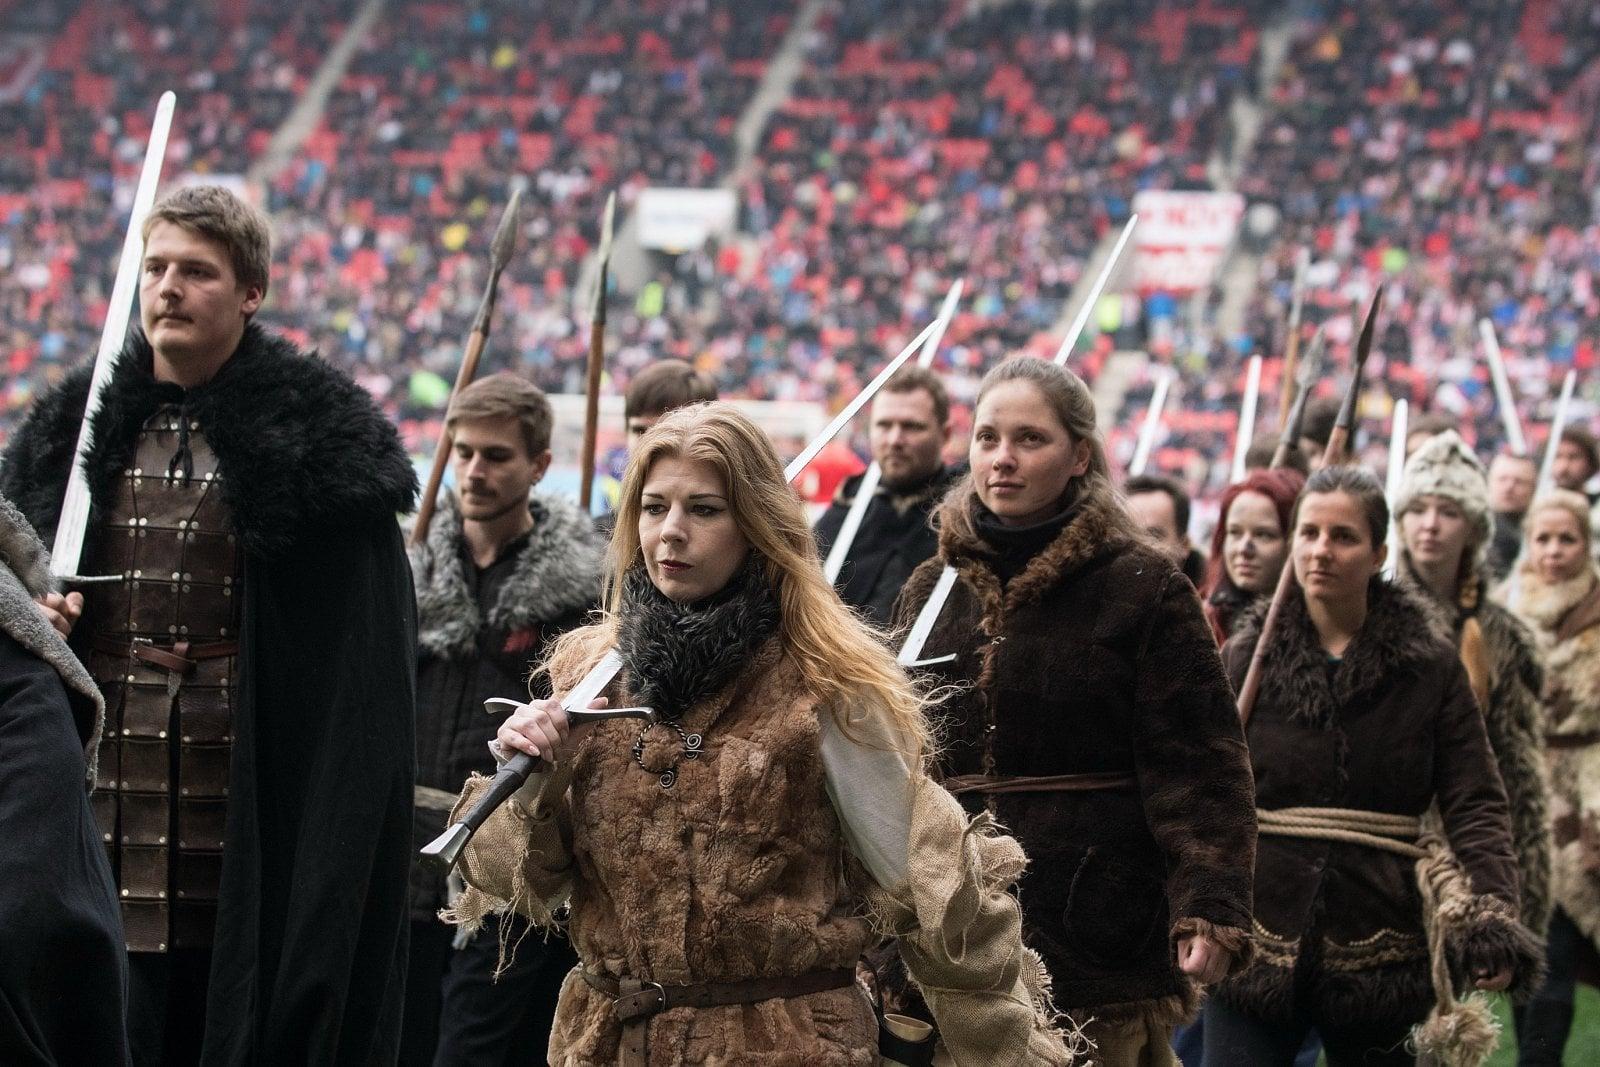 Hra o trůny při derby pražských S